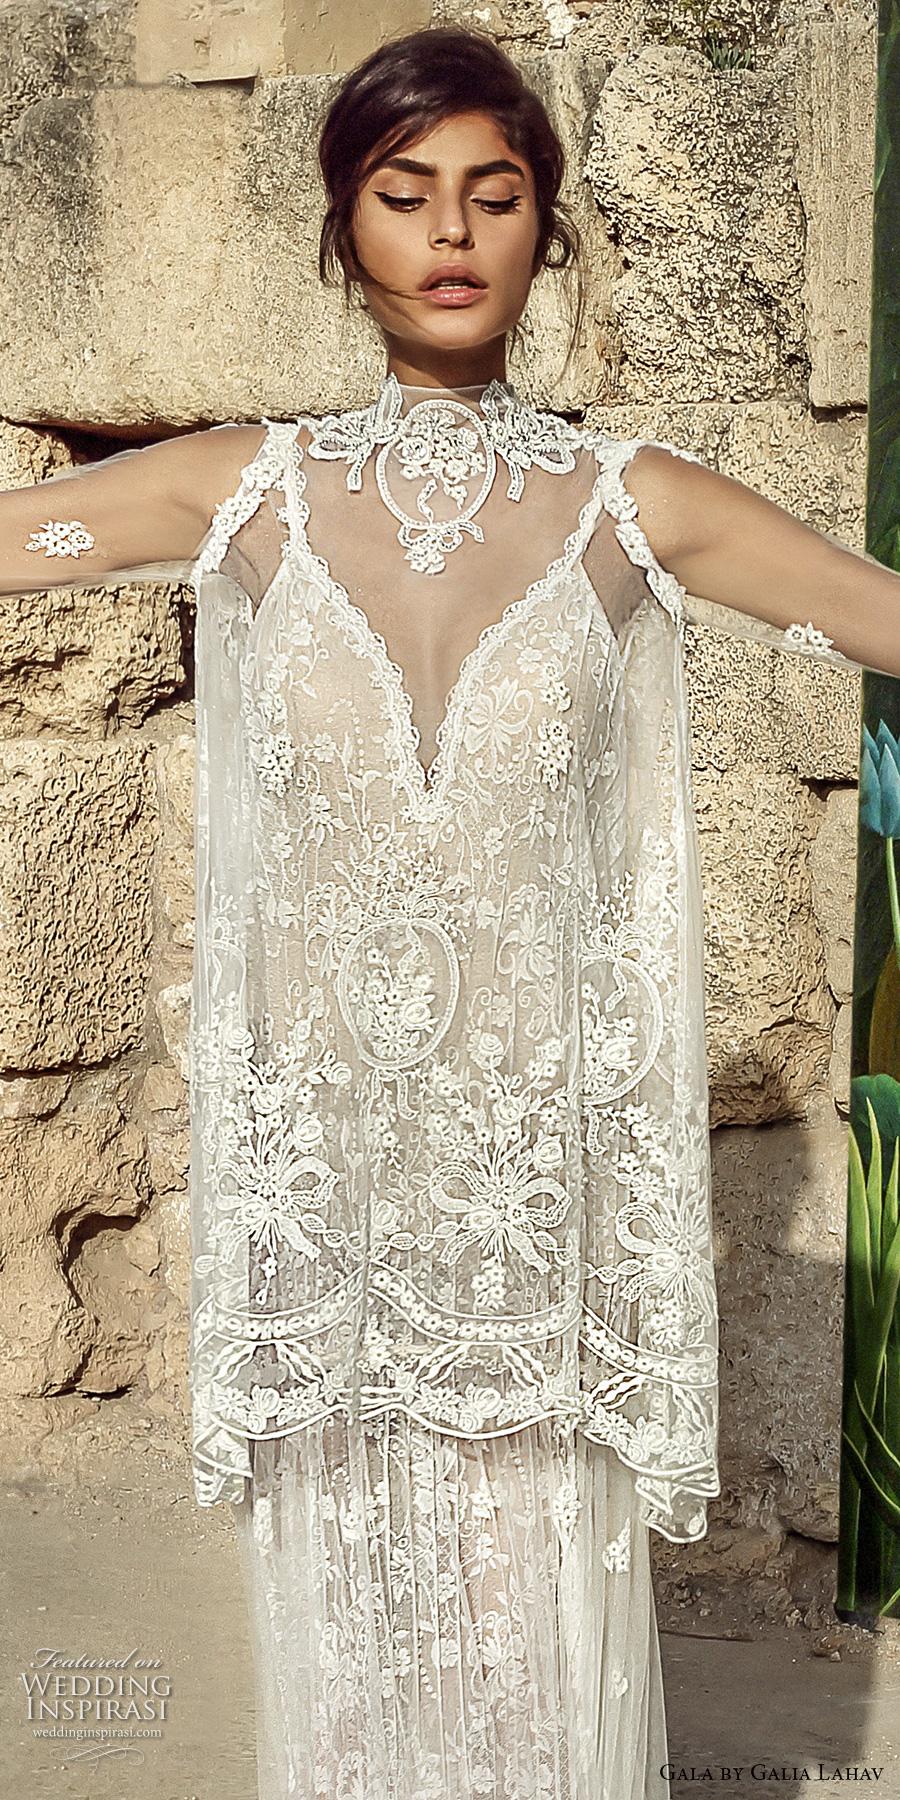 galia lahav gala 2017 bridal sheer long sleeves illusion high neck topper deep v neck full embellishment elegant vintage lace column wedding dress full lace back chapel train (807) zv